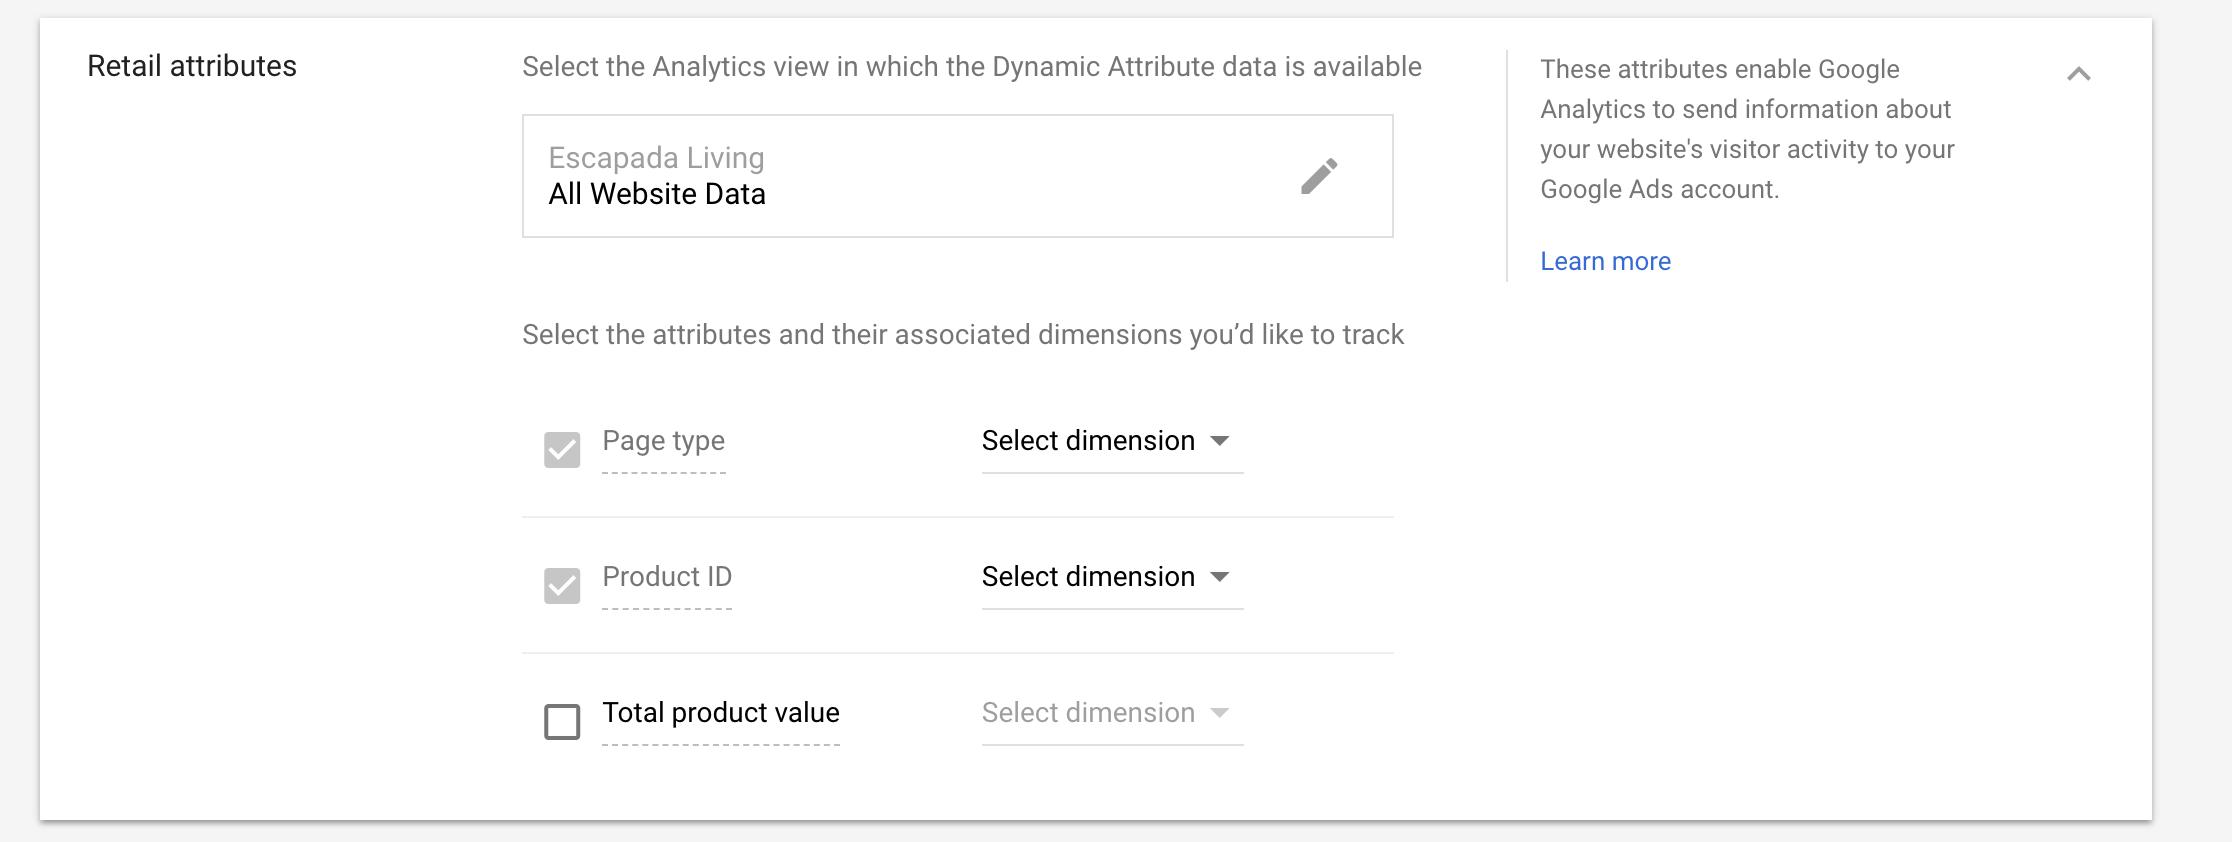 adwords google analytics retail attributes